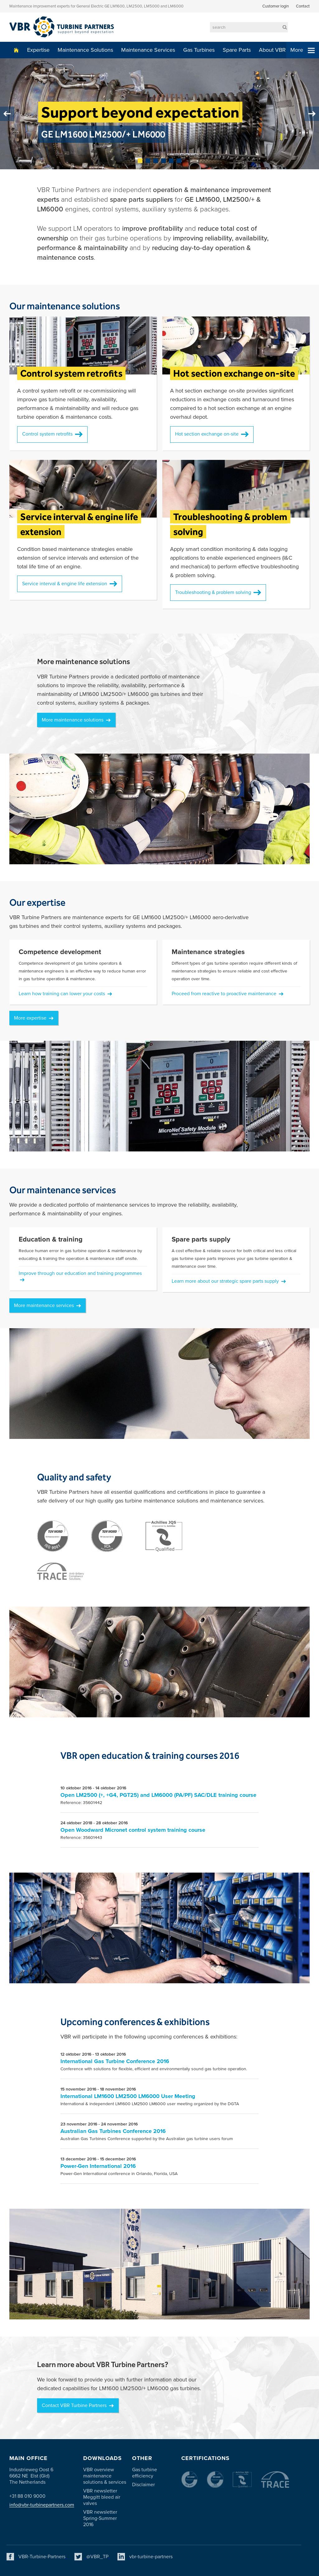 Vbr Turbine Partners Competitors, Revenue and Employees